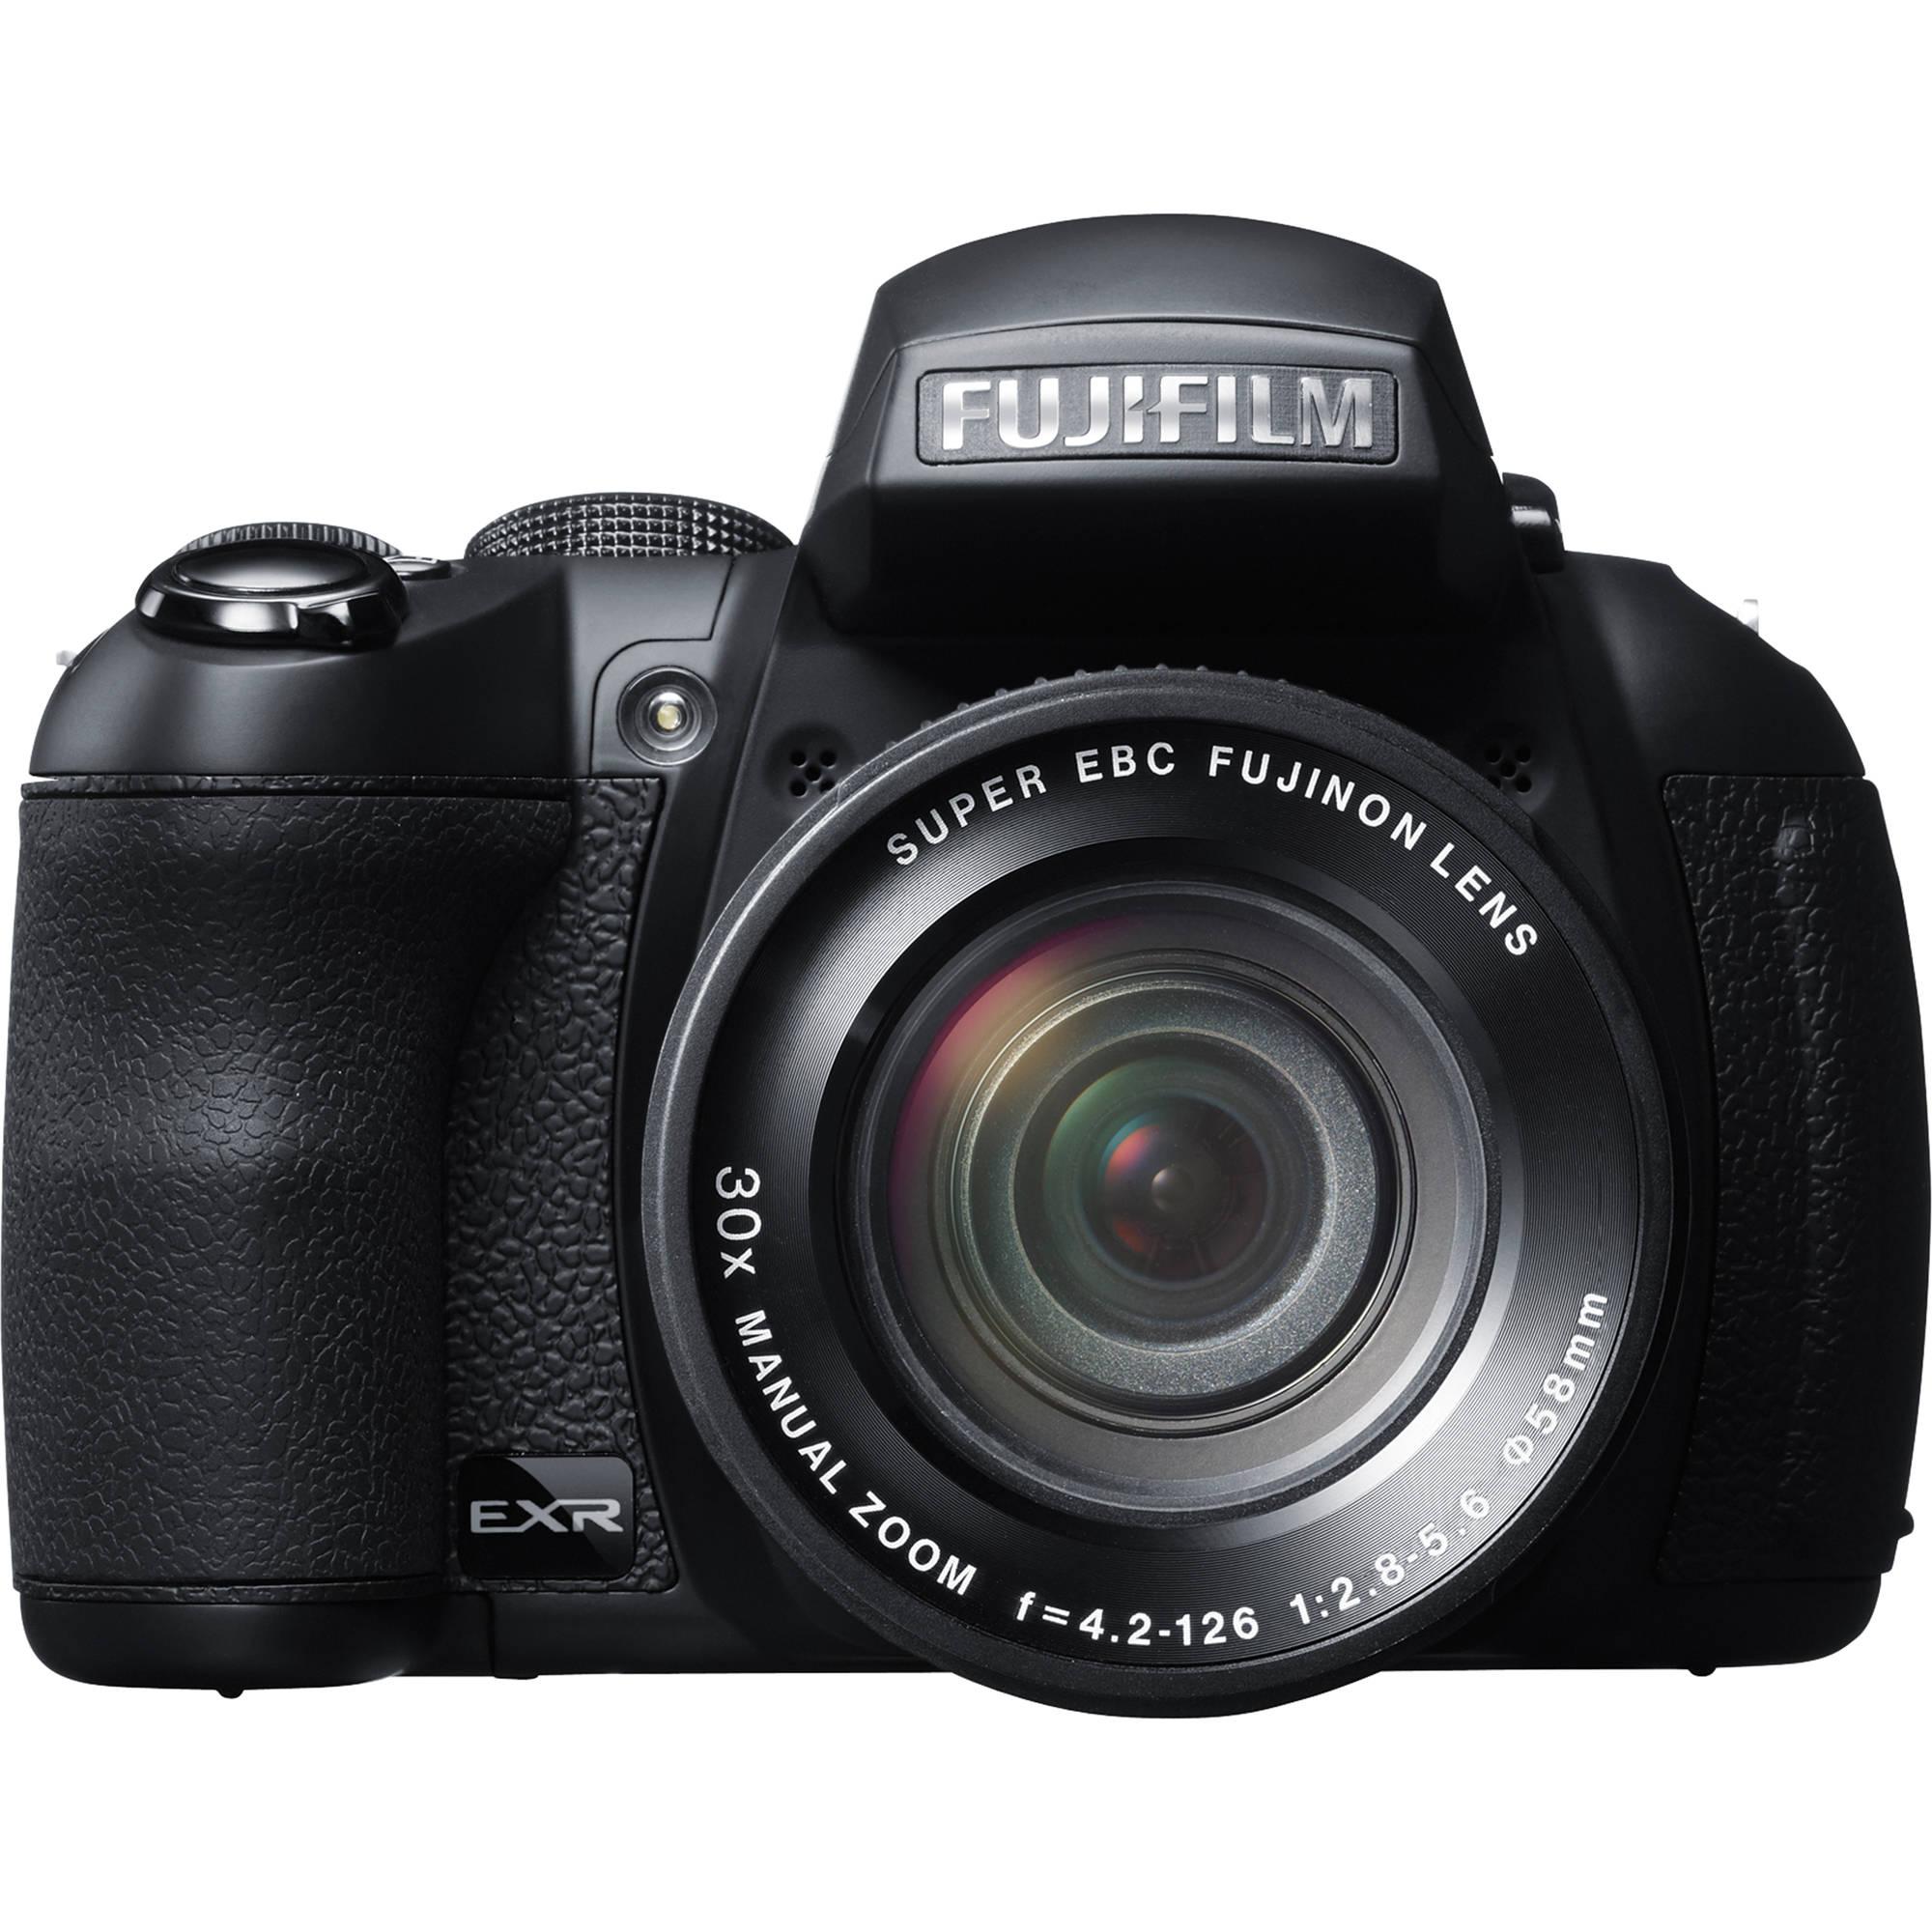 Fuji Digital Cameras: FUJIFILM FinePix HS35EXR Digital Camera 16286187 B&H Photo